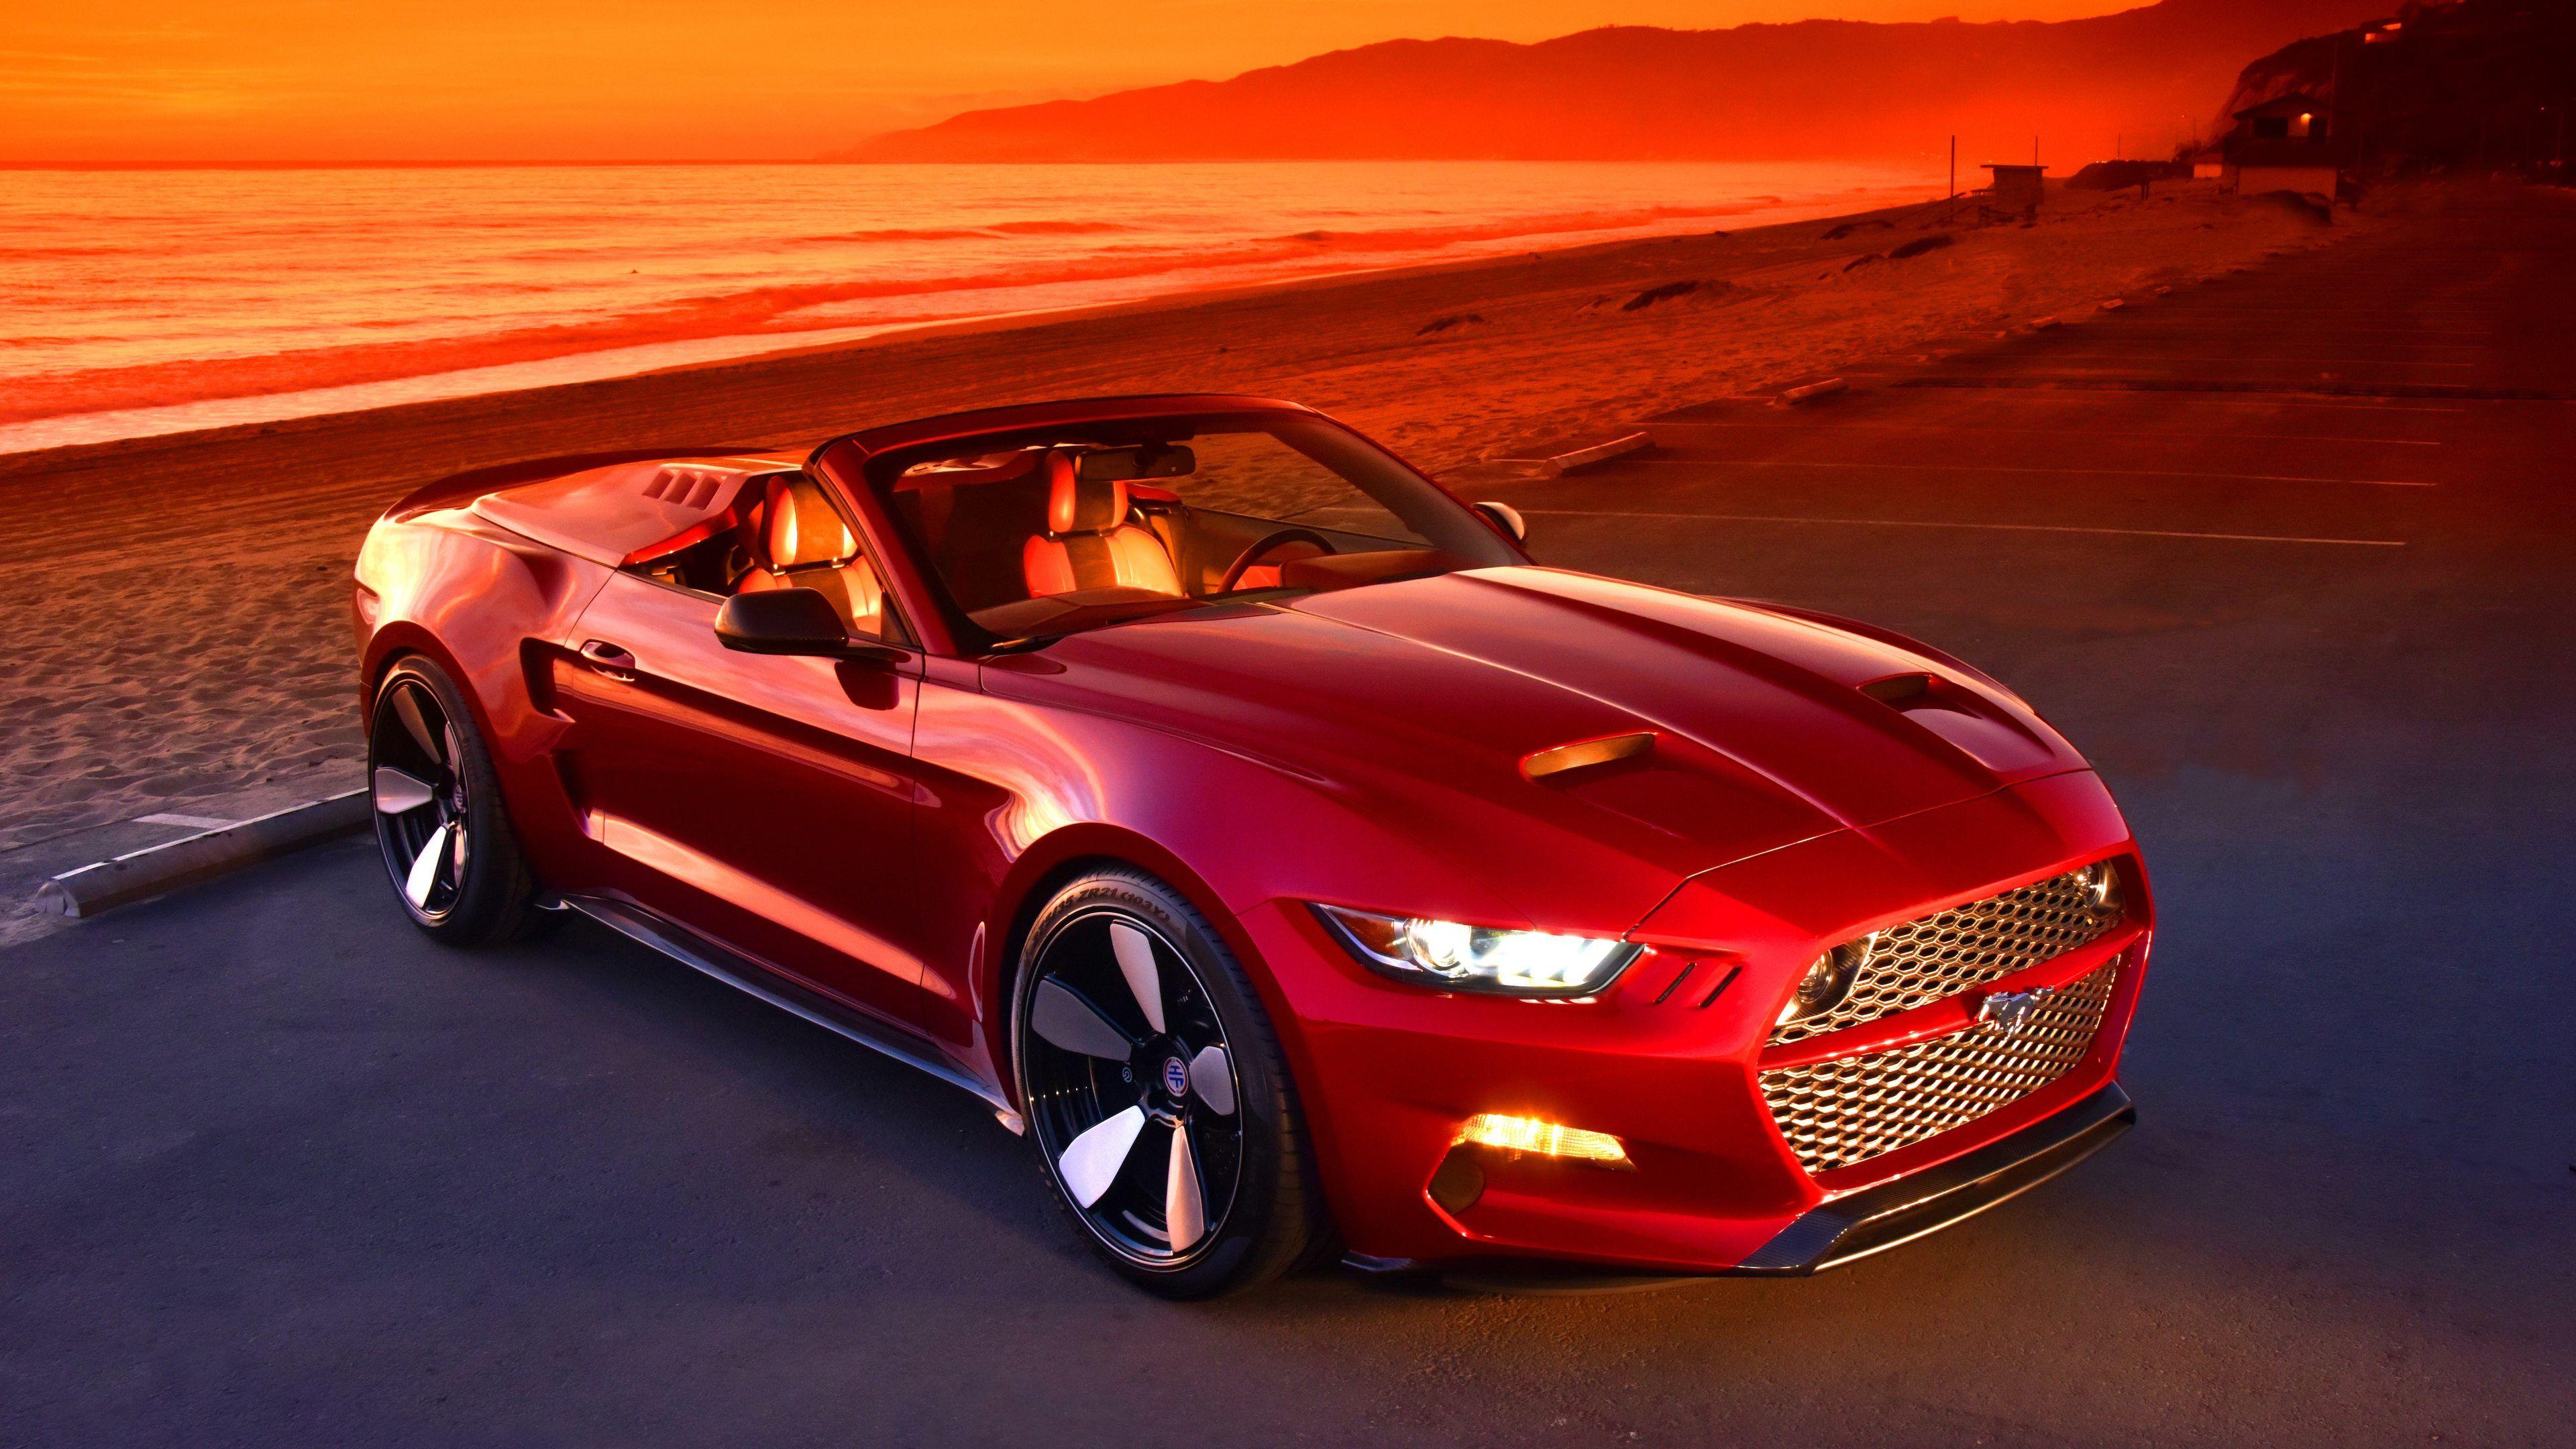 Wallpaper 4k Red Mustang 5k 4k Wallpapers 5k Wallpapers Cars